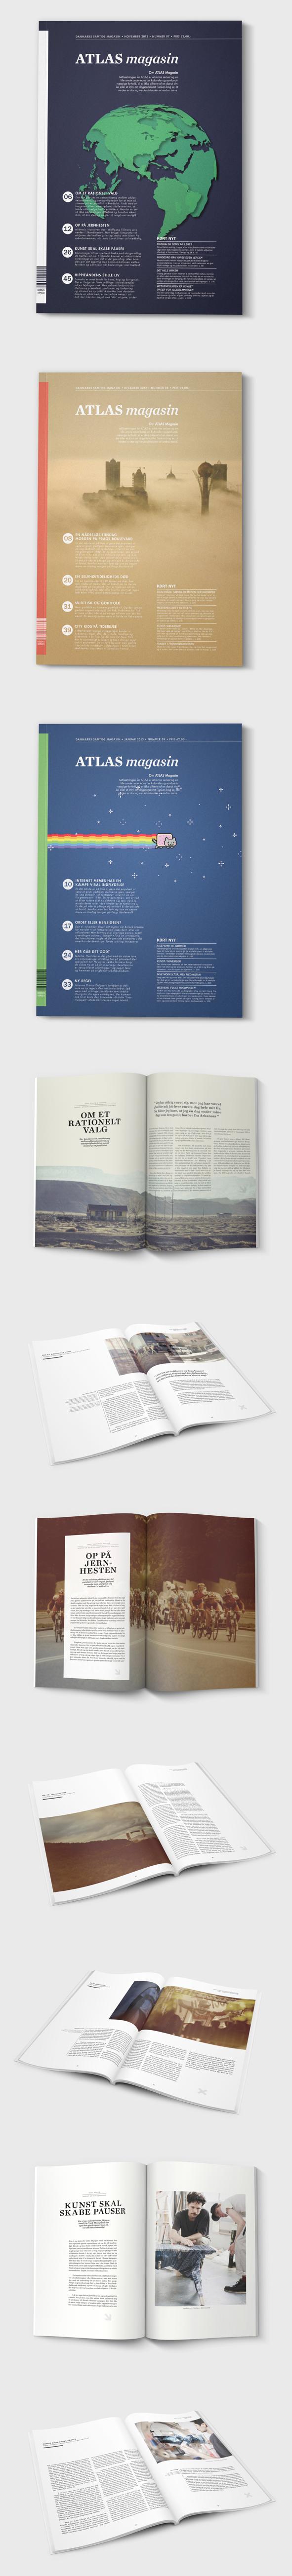 Atlas magazine by Christoffer Birkkjaer